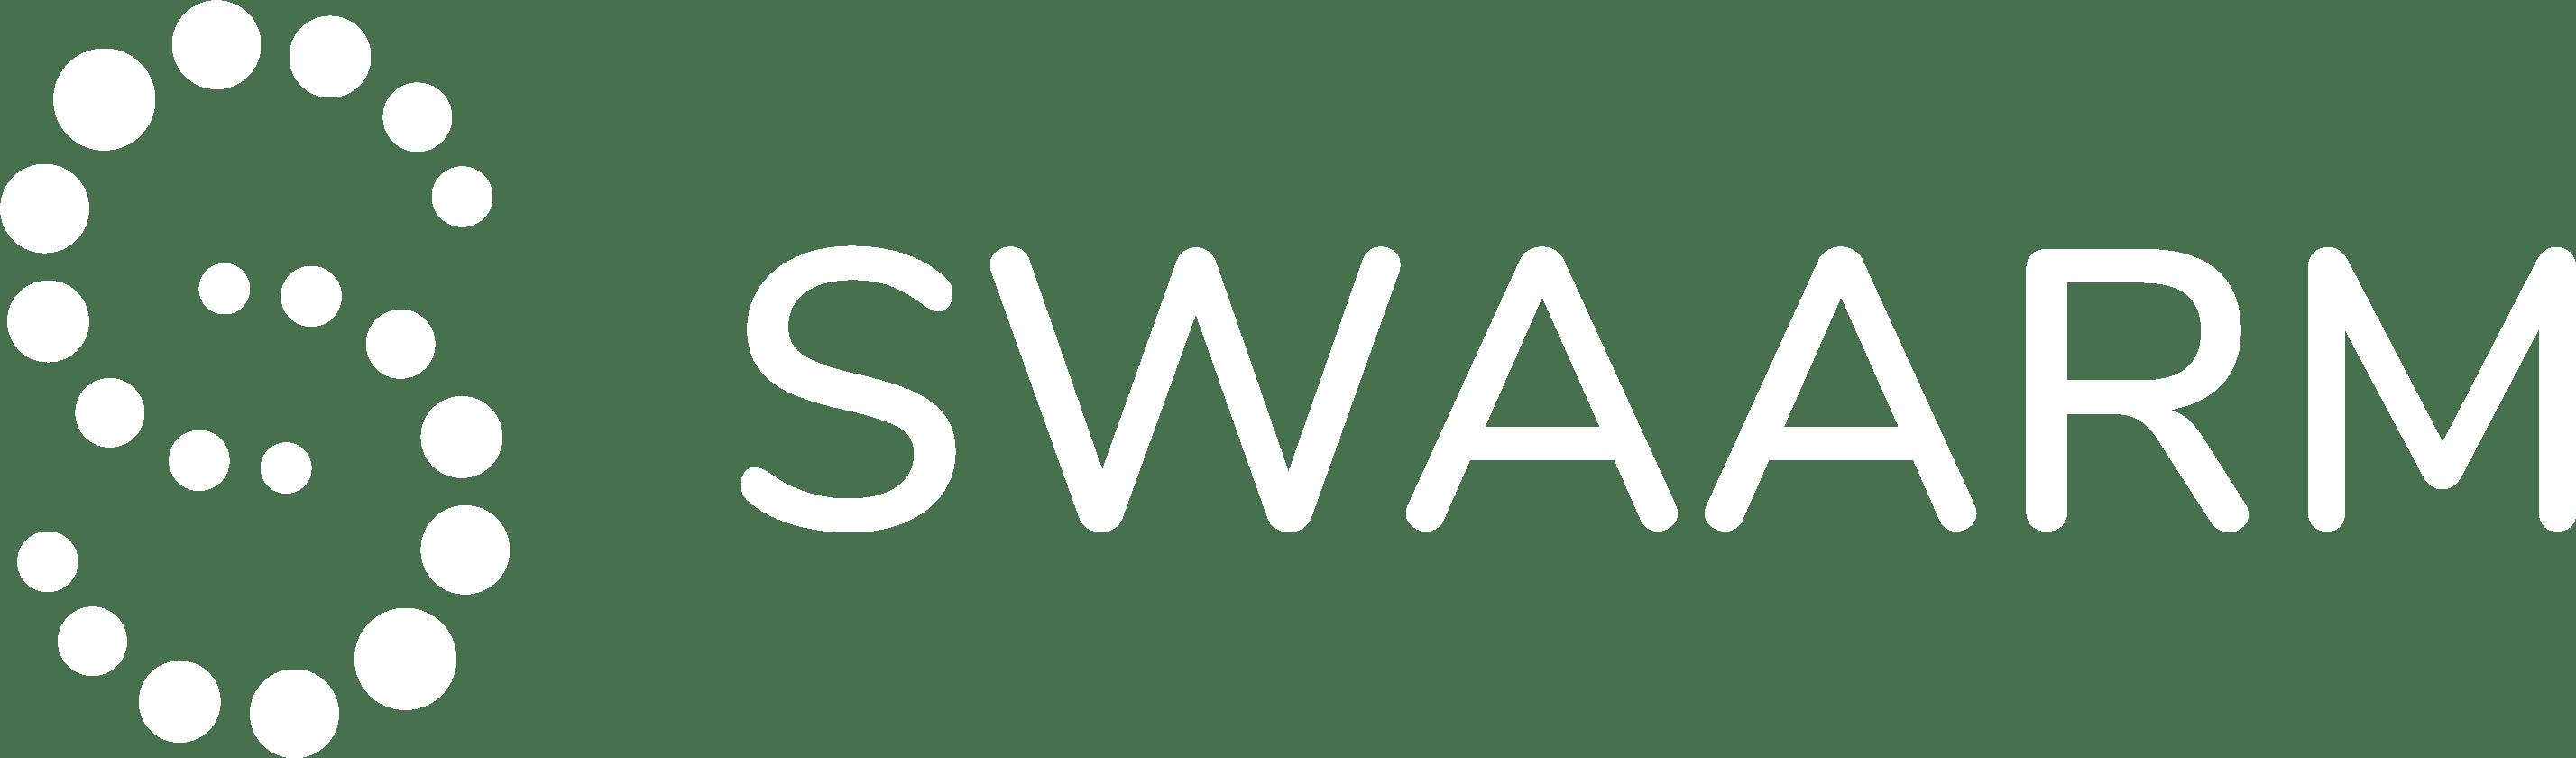 Swaarm Logo